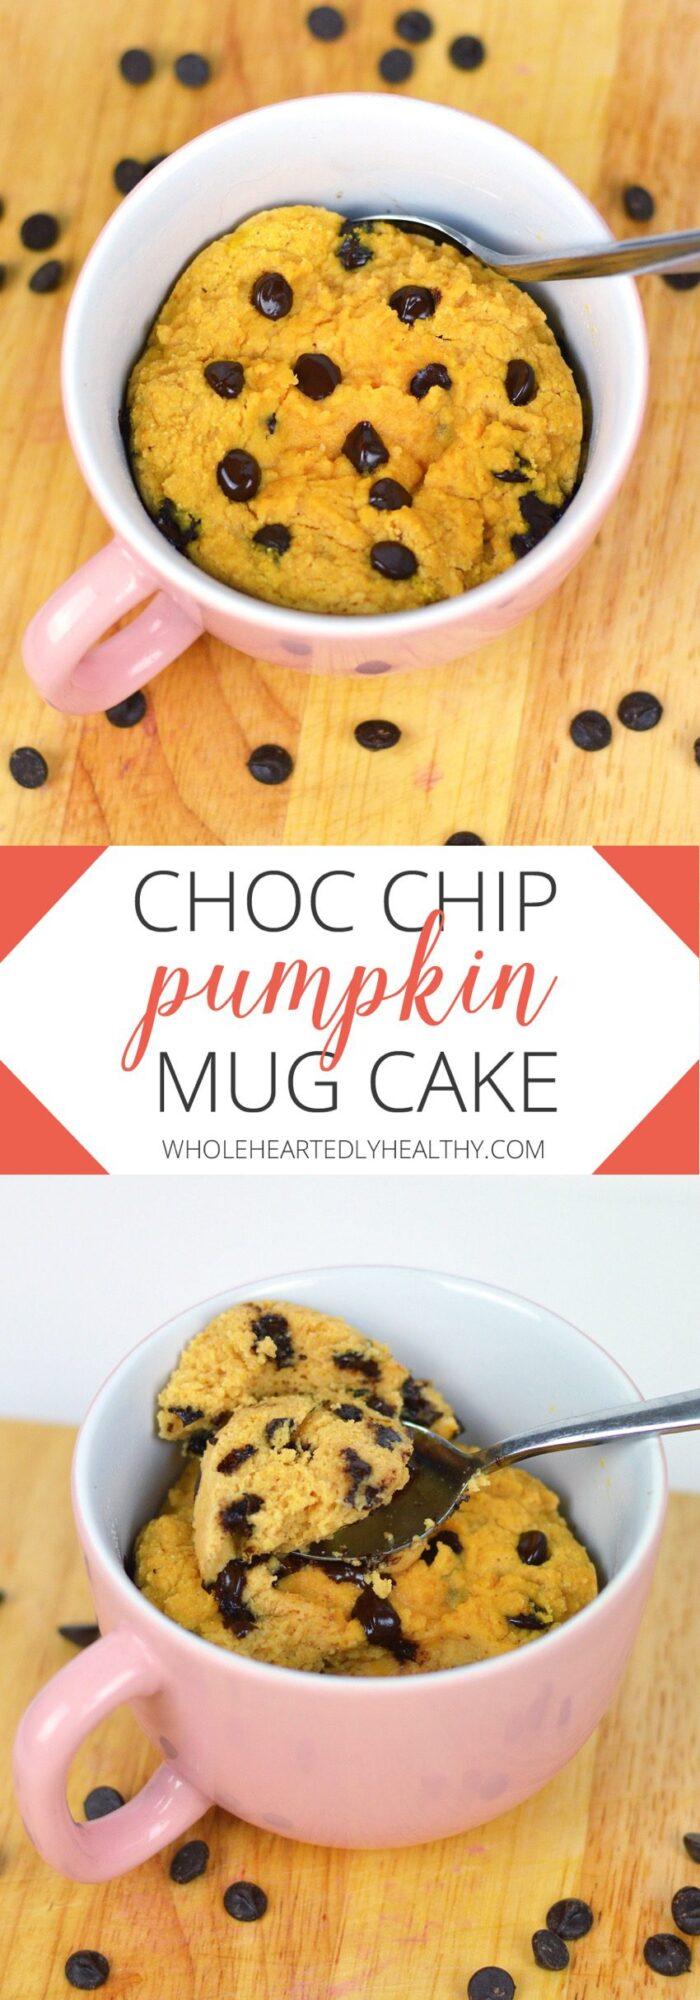 Choc chip pumpkin mug cake recipe